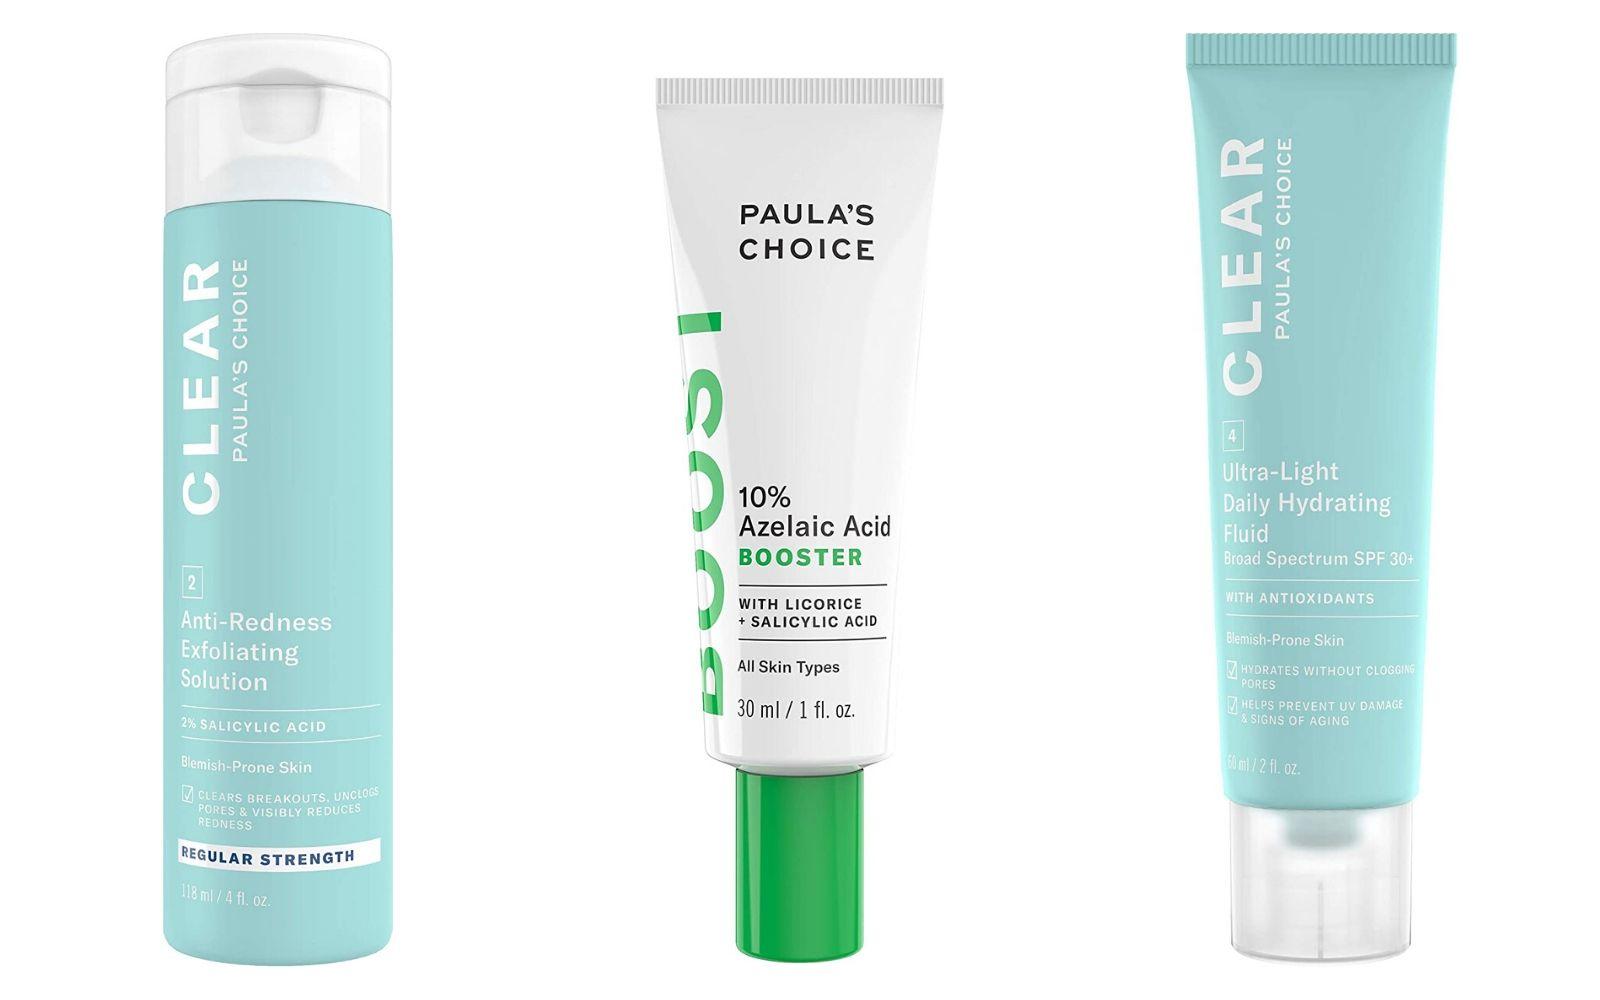 My favourite cruelty free paula's choice products